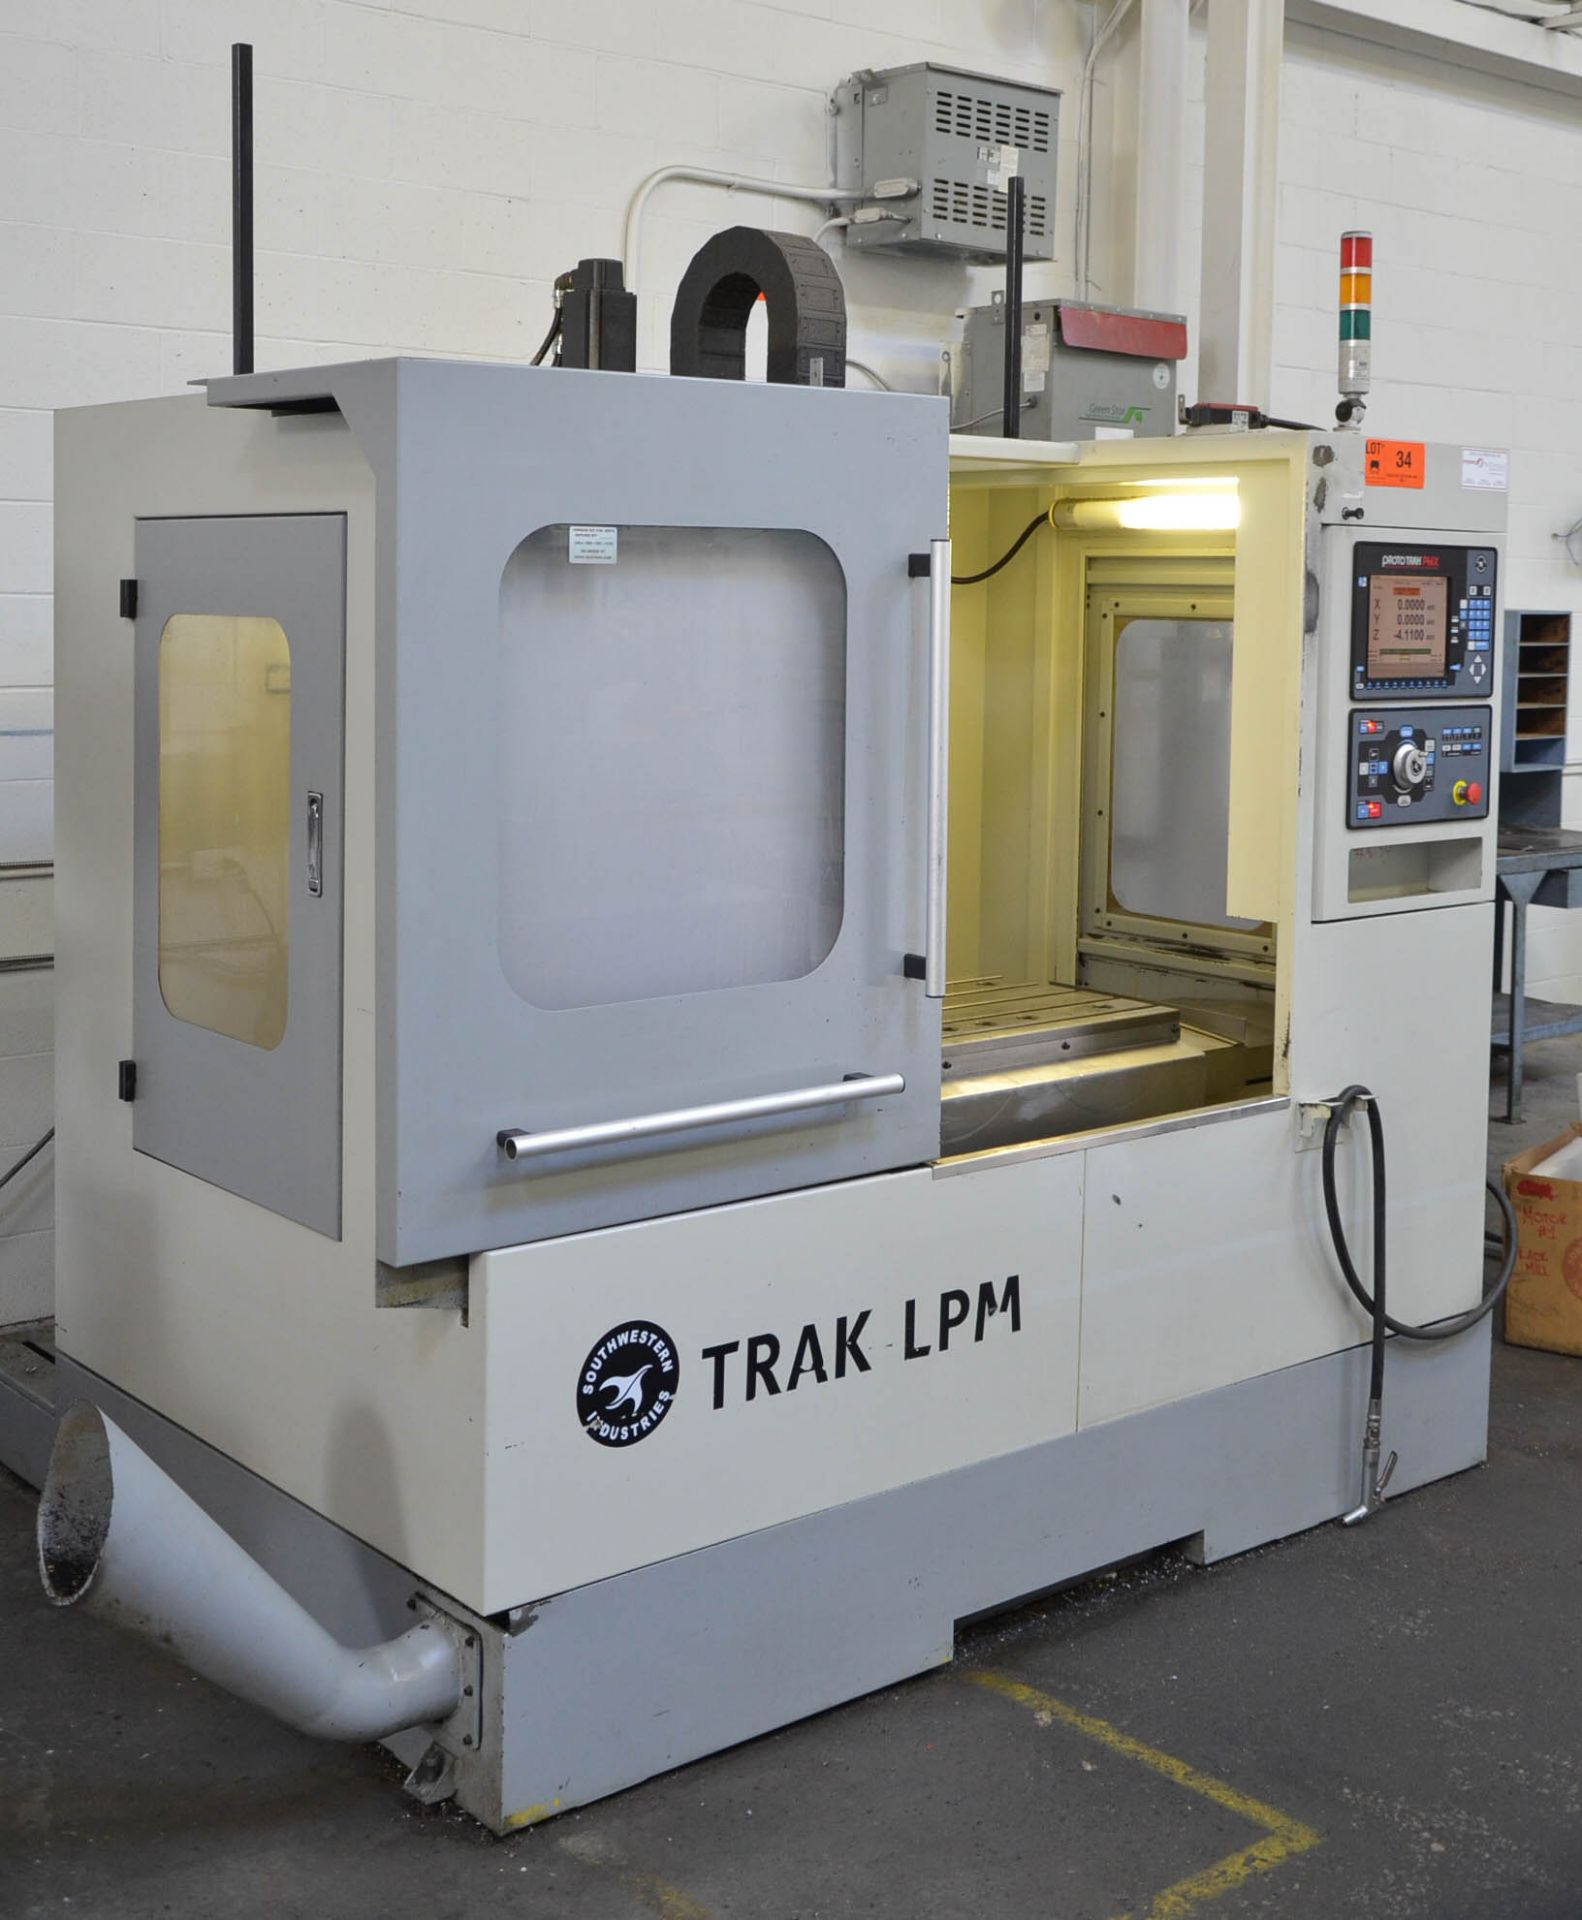 "SWI (2014) TRAK LPM CNC VERTICAL MACHINING CENTER WITH PROTO TRAK PMX CNC CONTROL, 19.5"" X 35.5"" - Image 3 of 9"